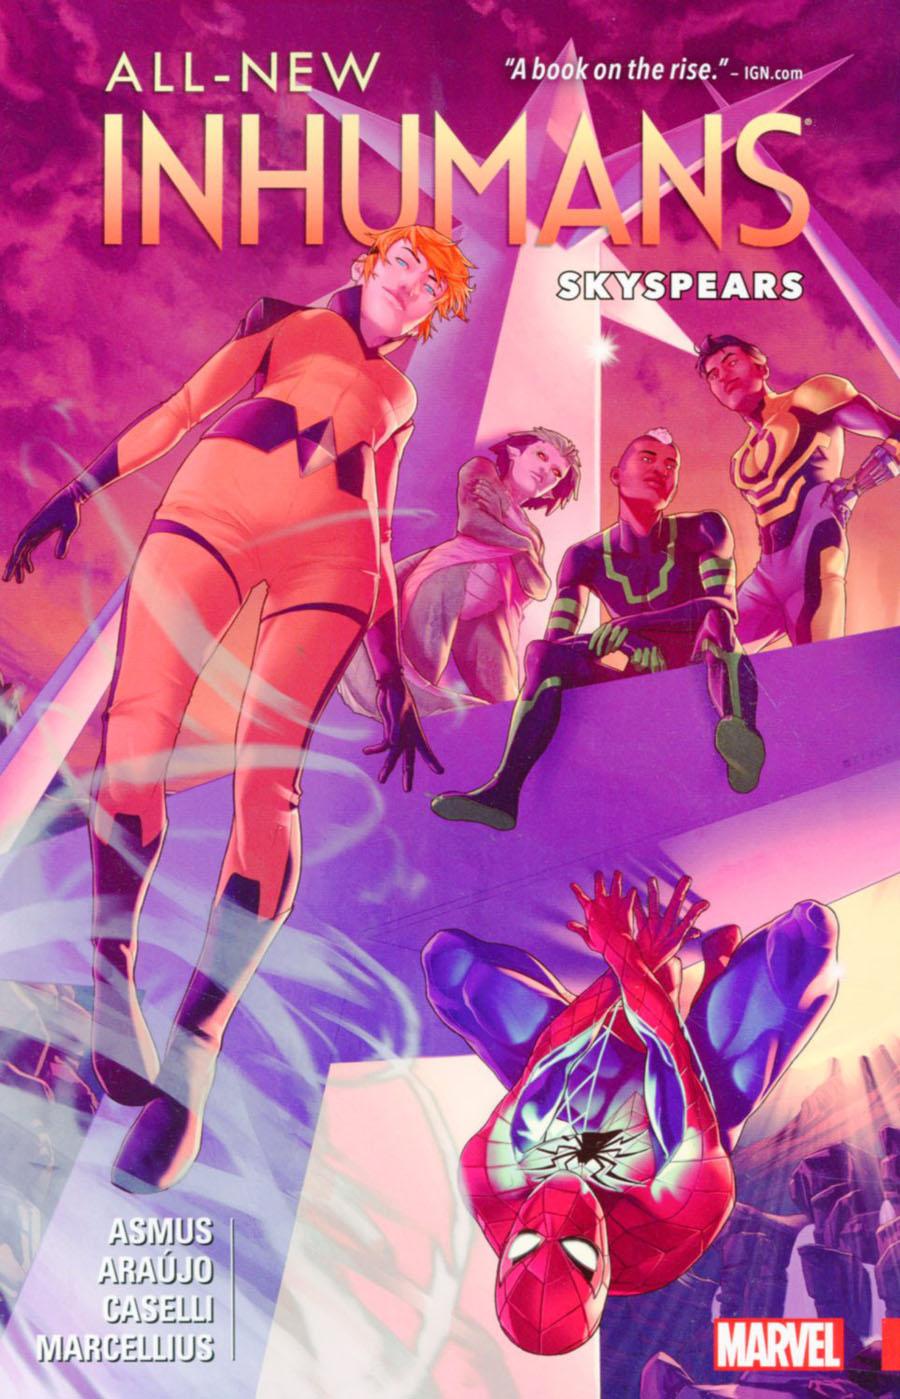 All-New Inhumans Vol 2 Skyspears TP